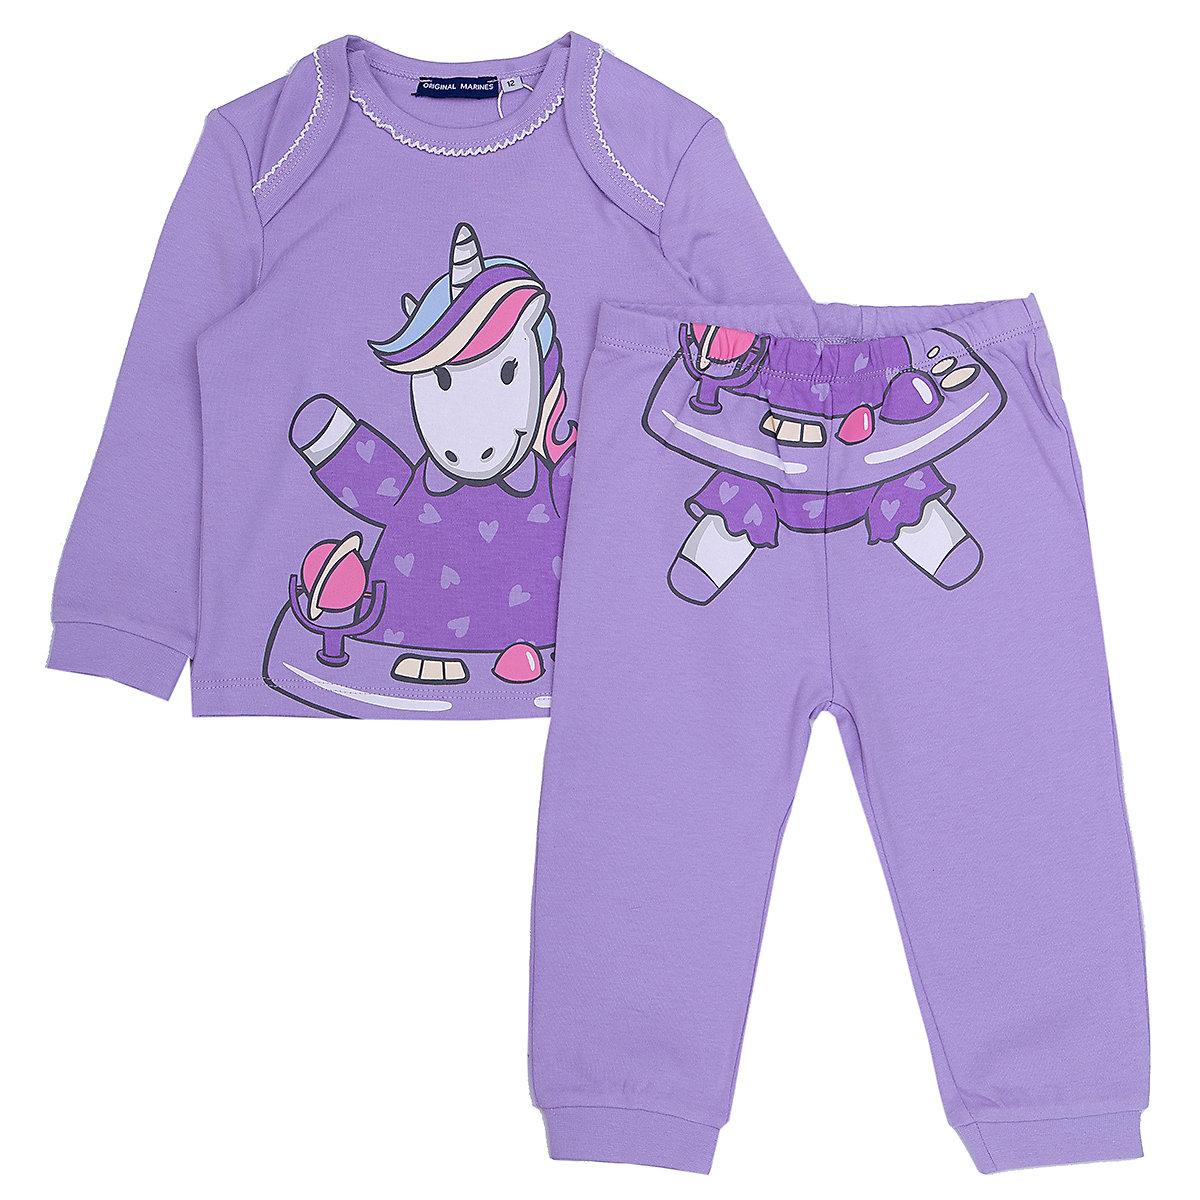 ORIGINAL MARINES Sleepwear & Robes 9501075 Cotton Baby Girls clothing pajamas